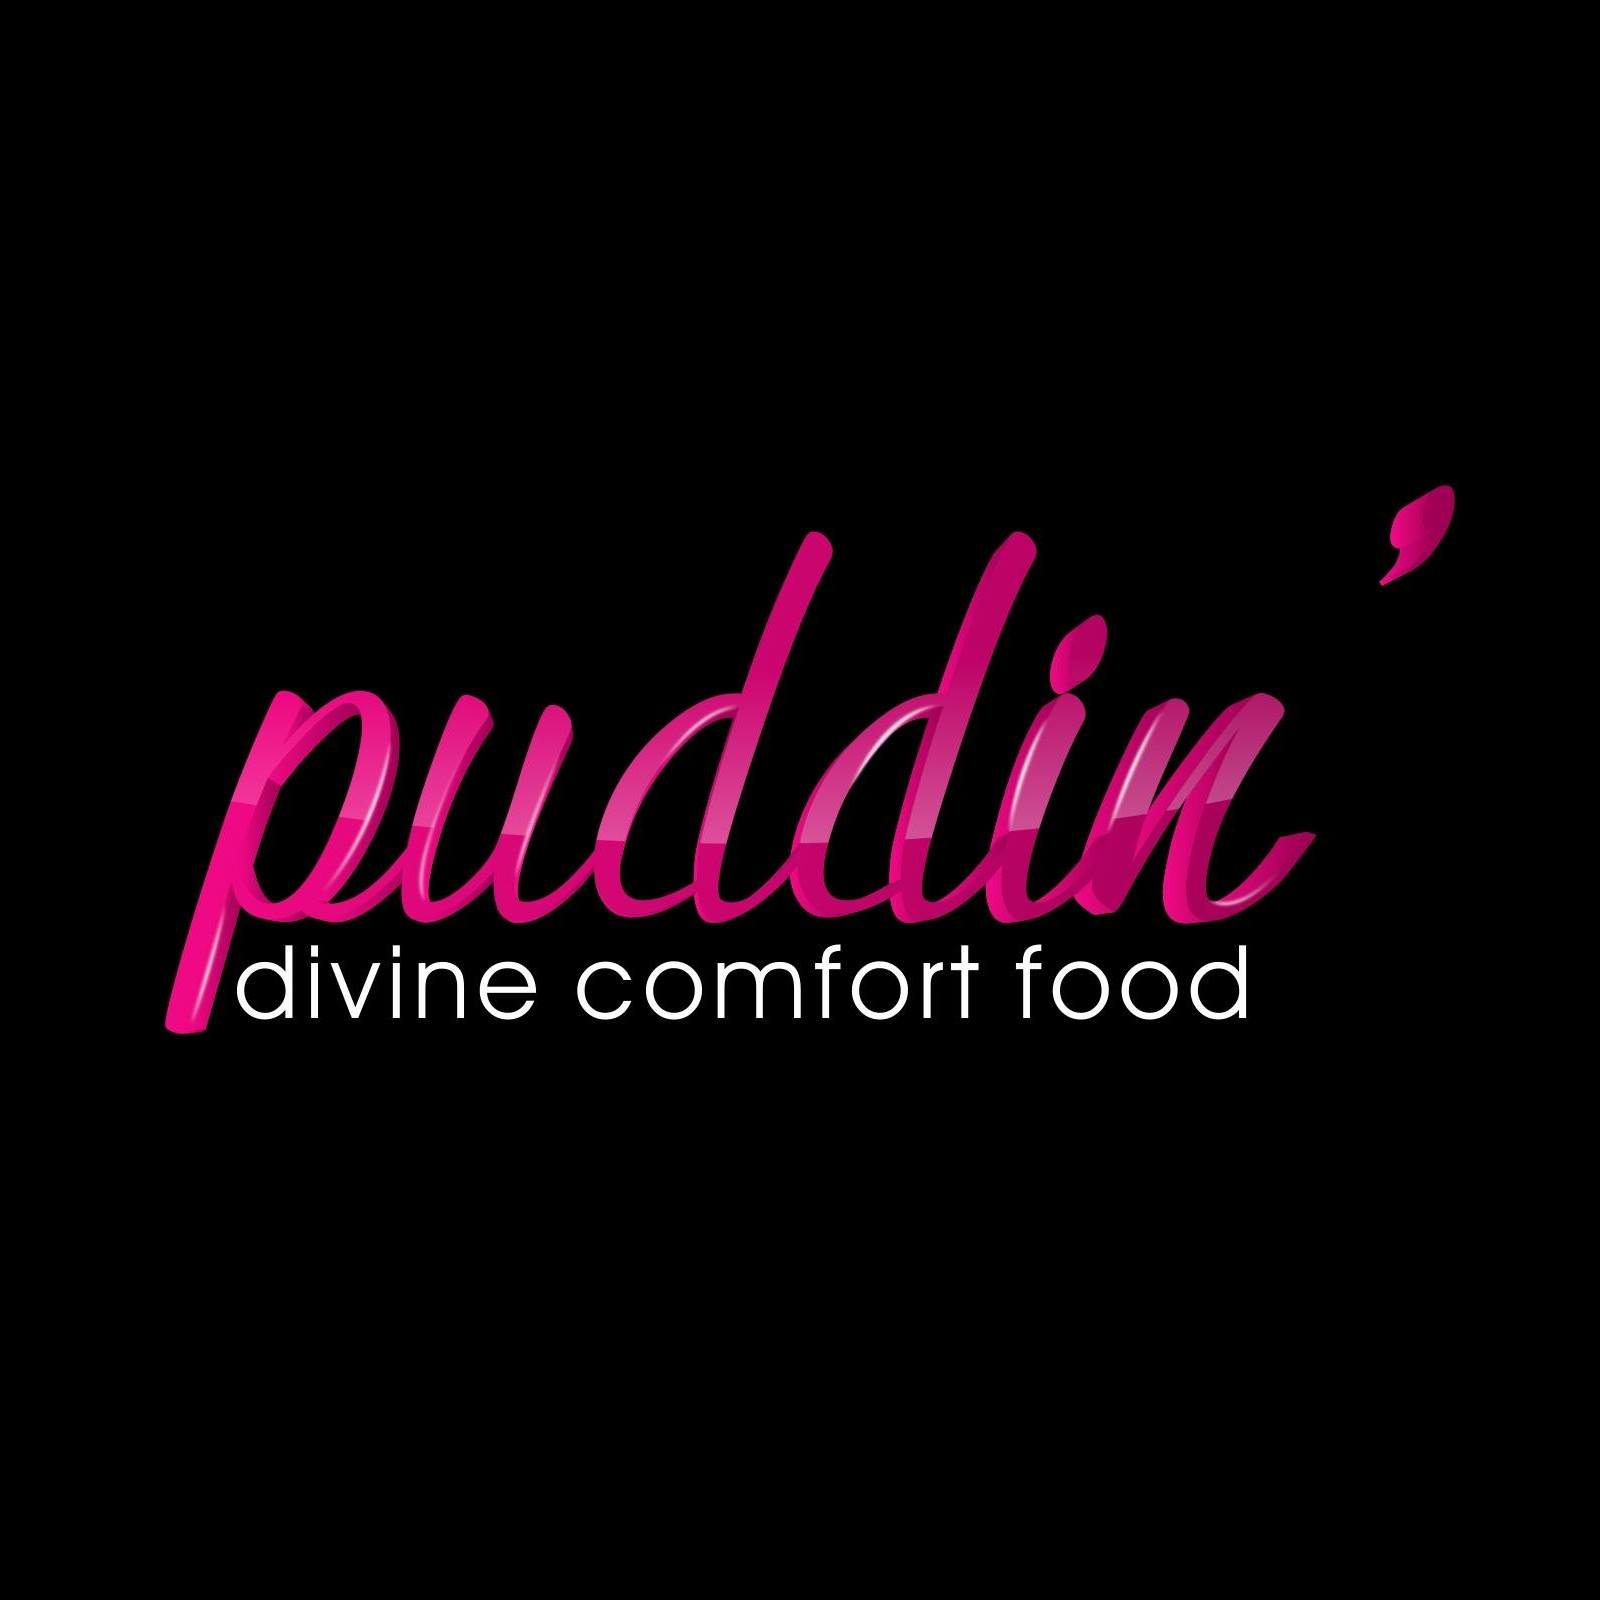 DC Puddin